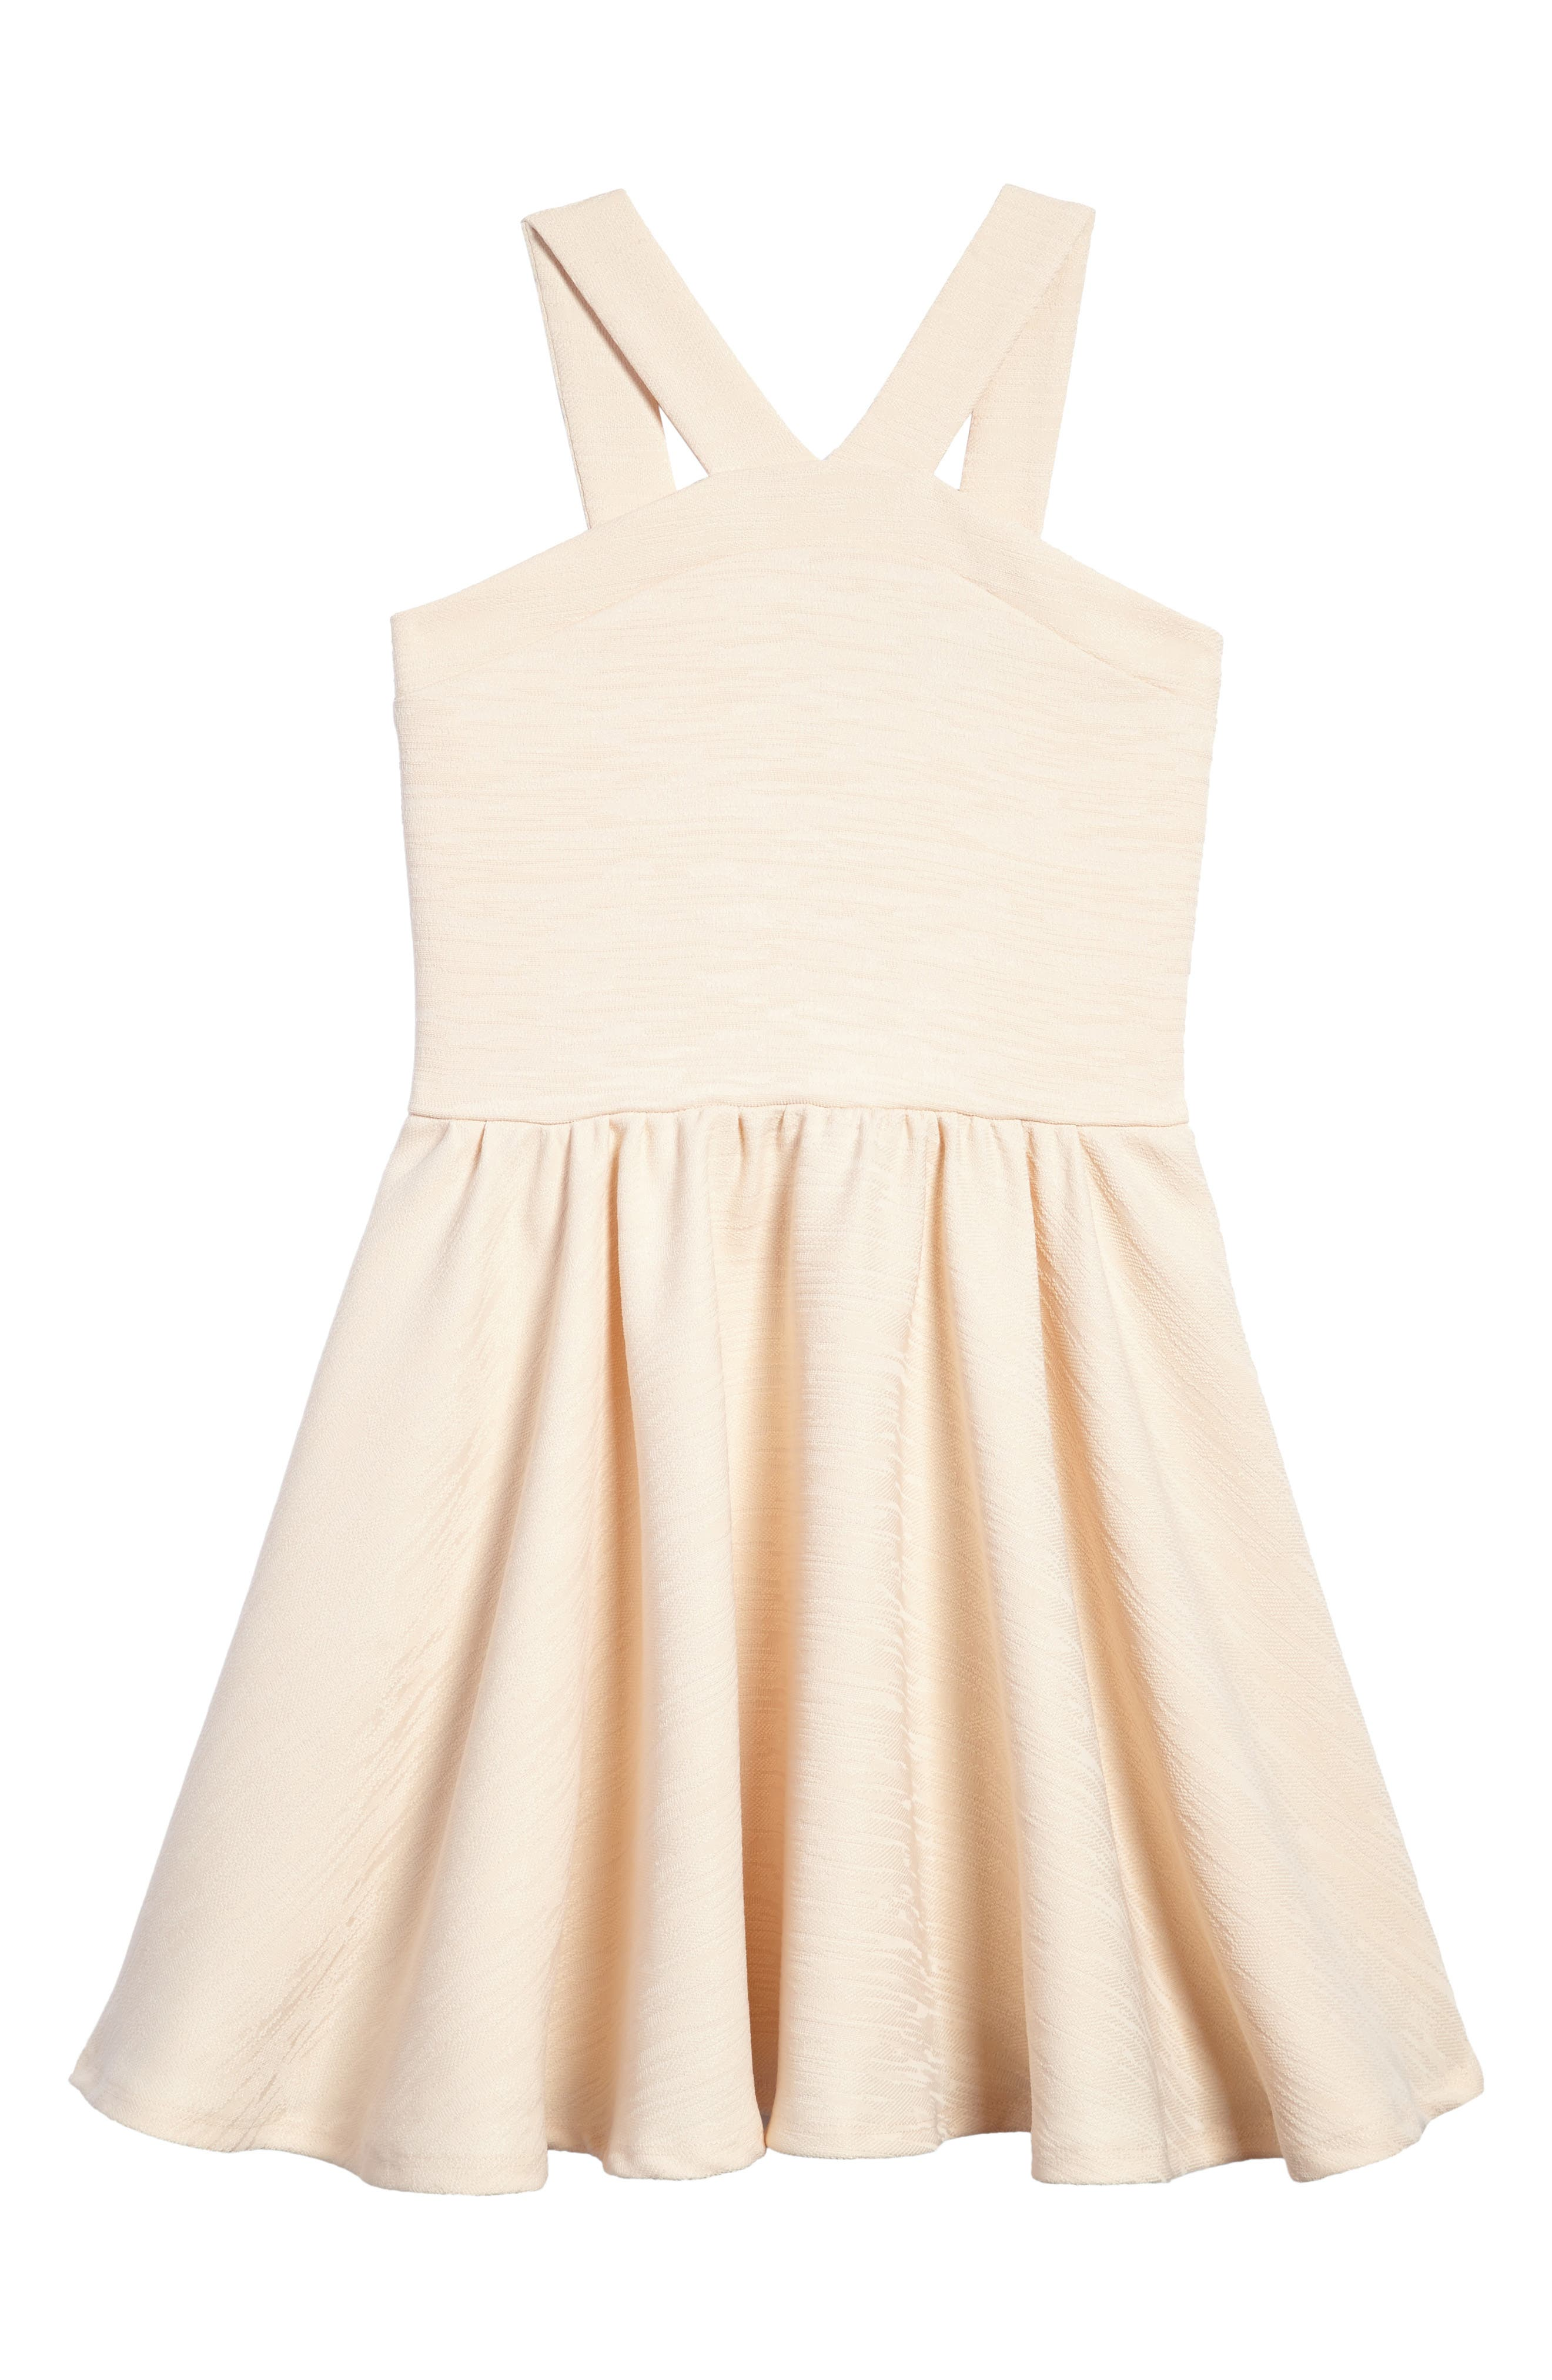 Stephanie Halter Dress,                         Main,                         color, Beige